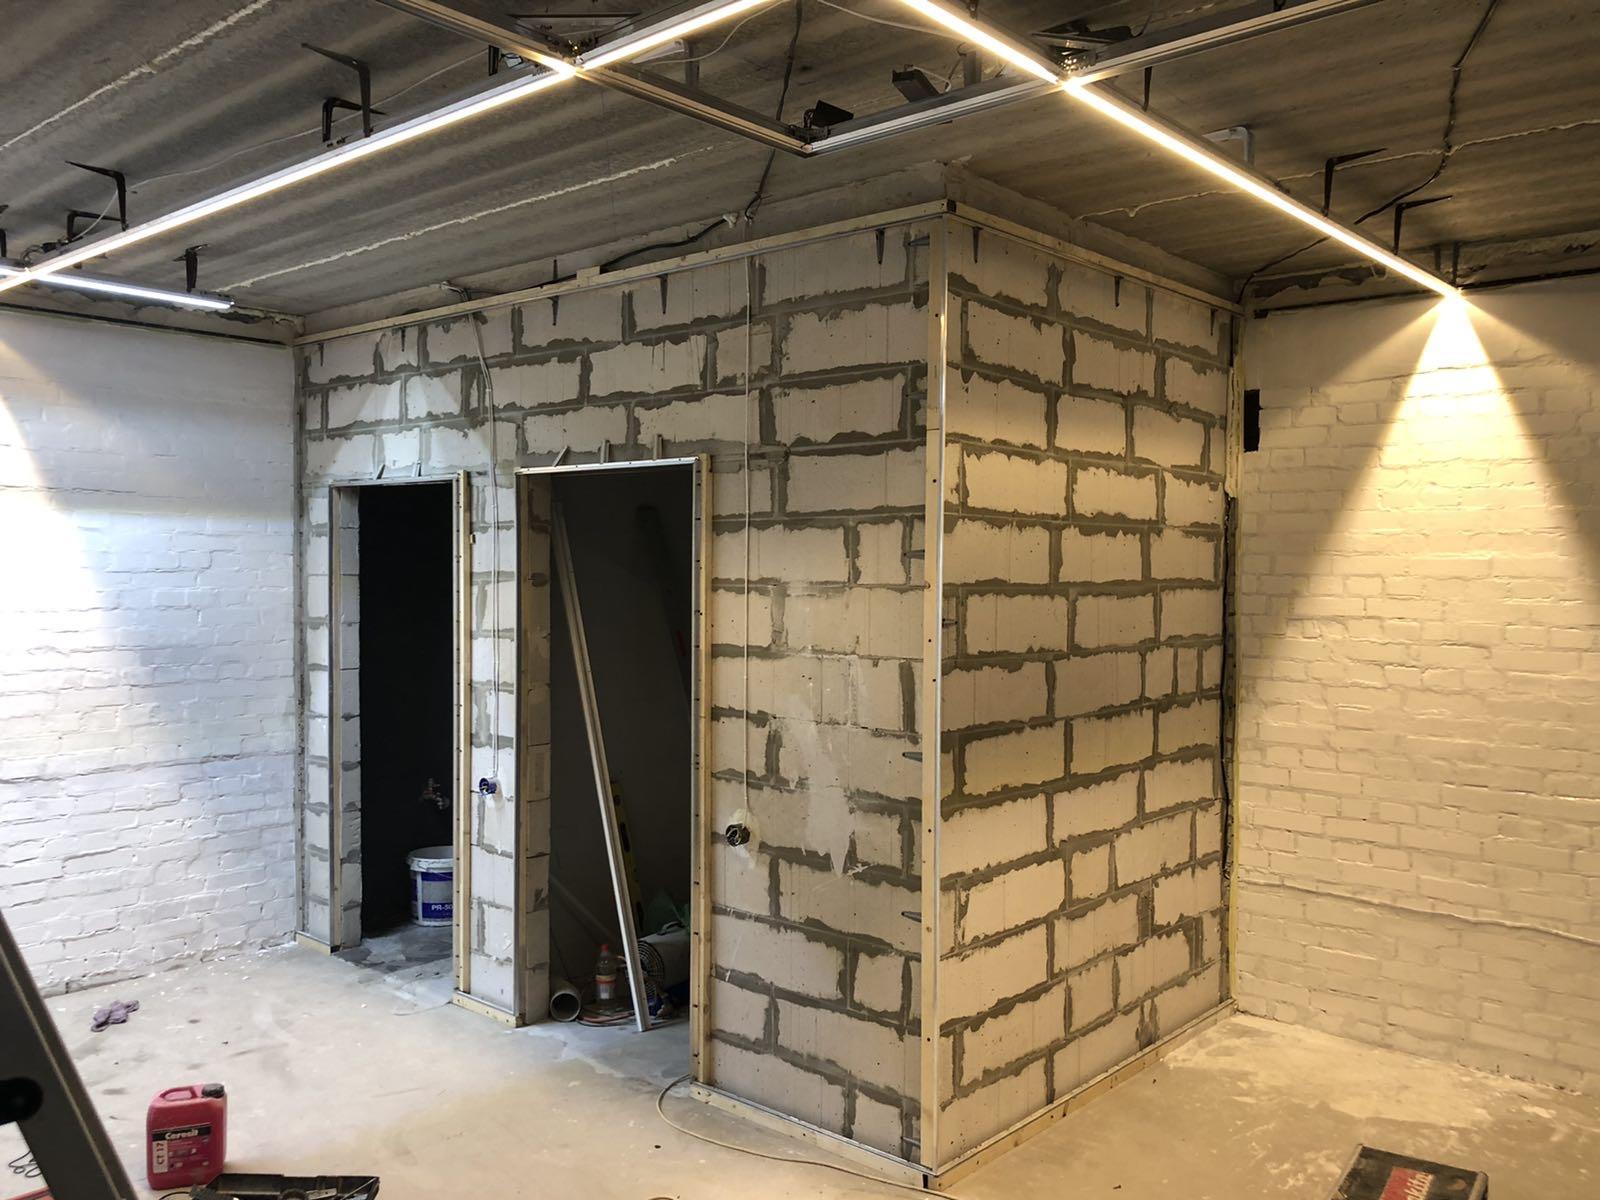 Sufity napinane sufity napinane na ścianach mat satyna połysk